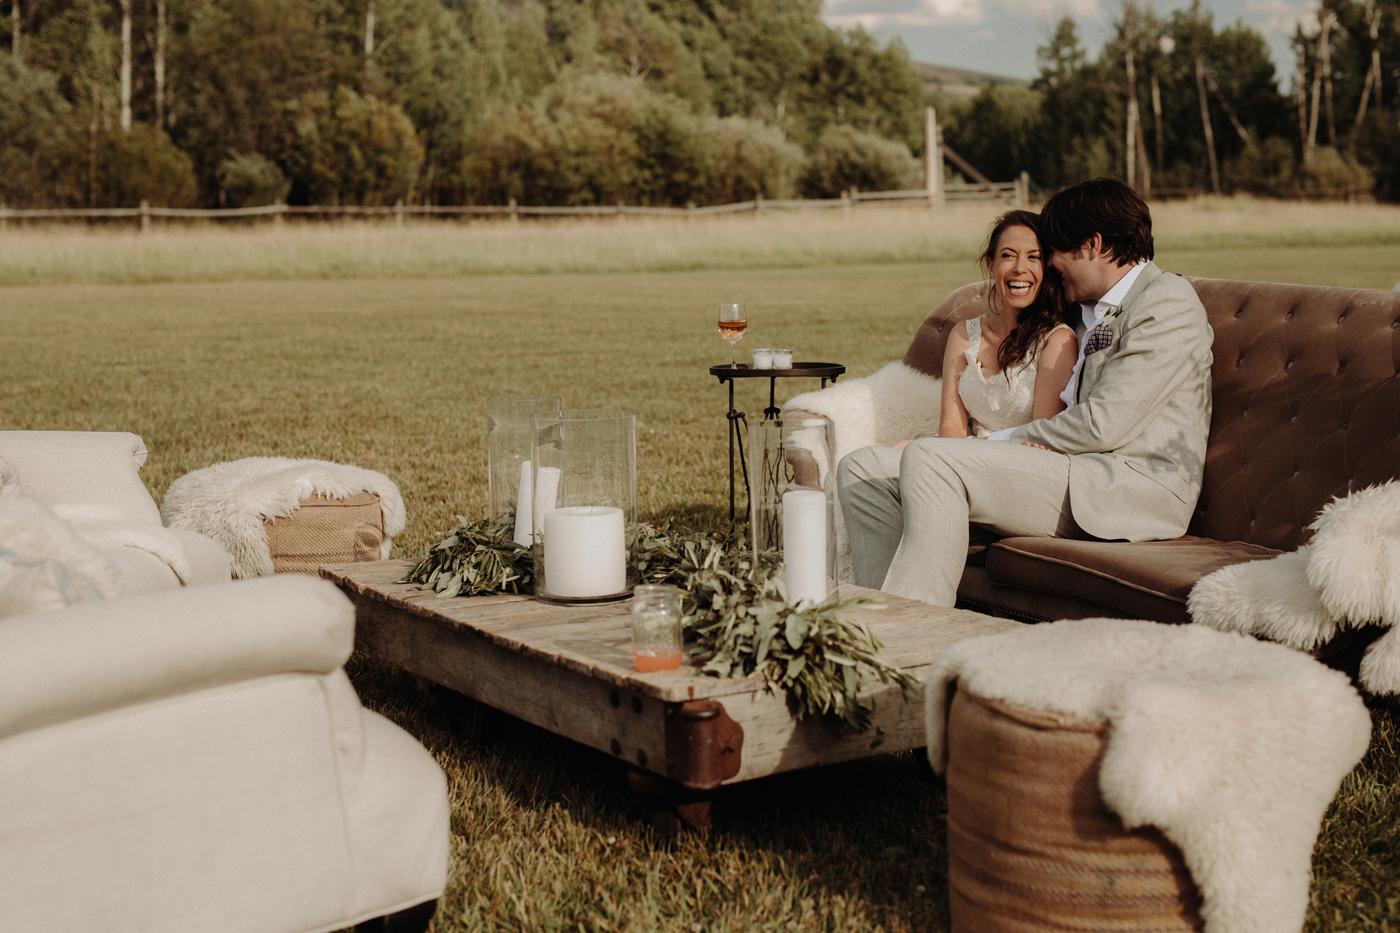 060-grand-teton-jackson-hole-wyoming-wedding.jpg